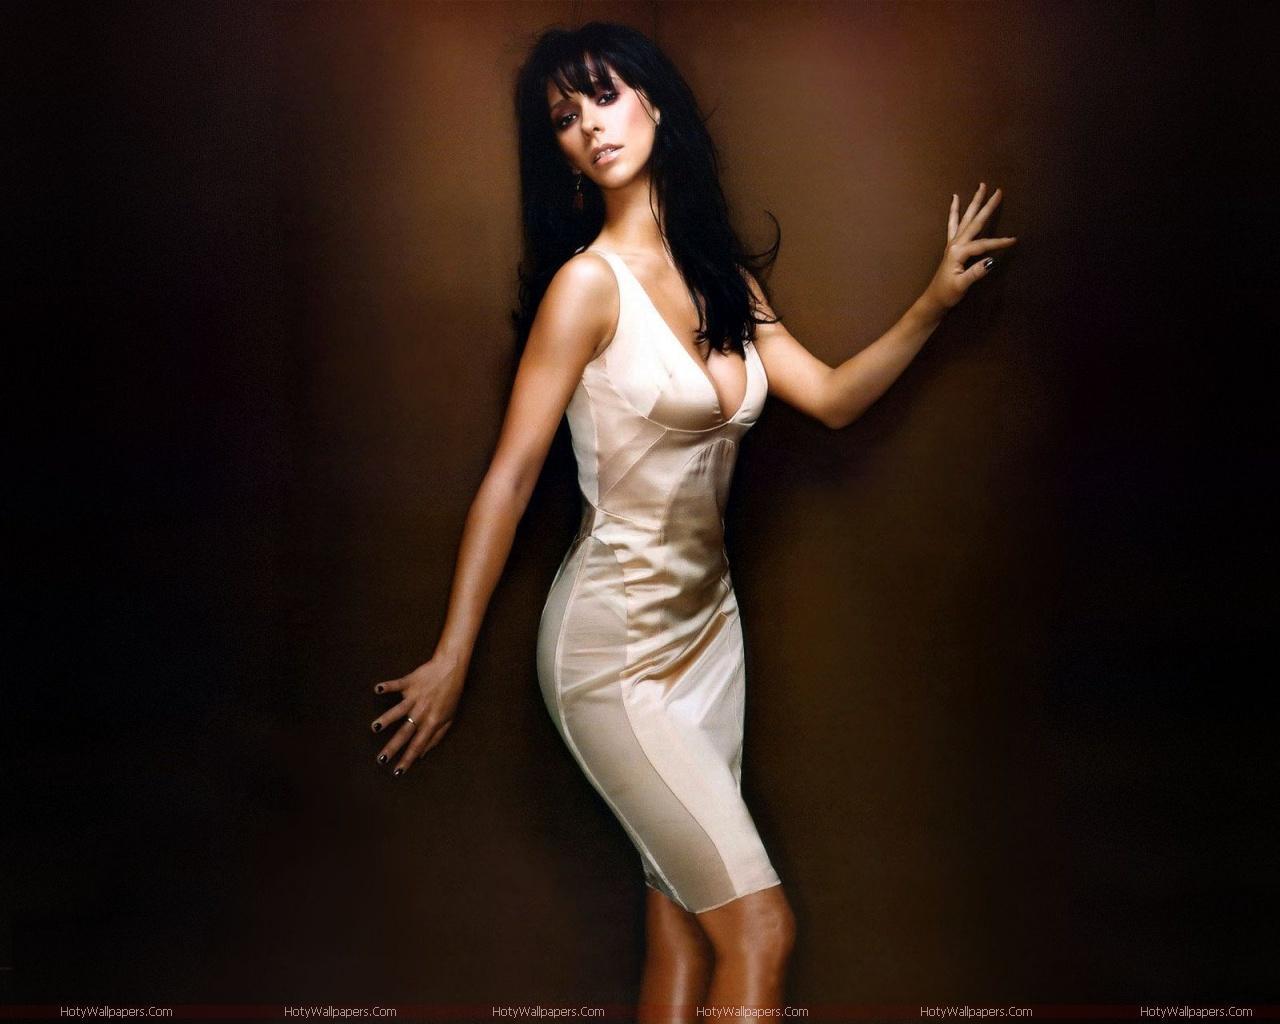 http://3.bp.blogspot.com/-eTZpIbU0KFM/TmjW-0GhmKI/AAAAAAAAKs8/0XKsNbAABek/s1600/Jennifer_Love_Hewitt_Hollywood_Wallpaper.jpg